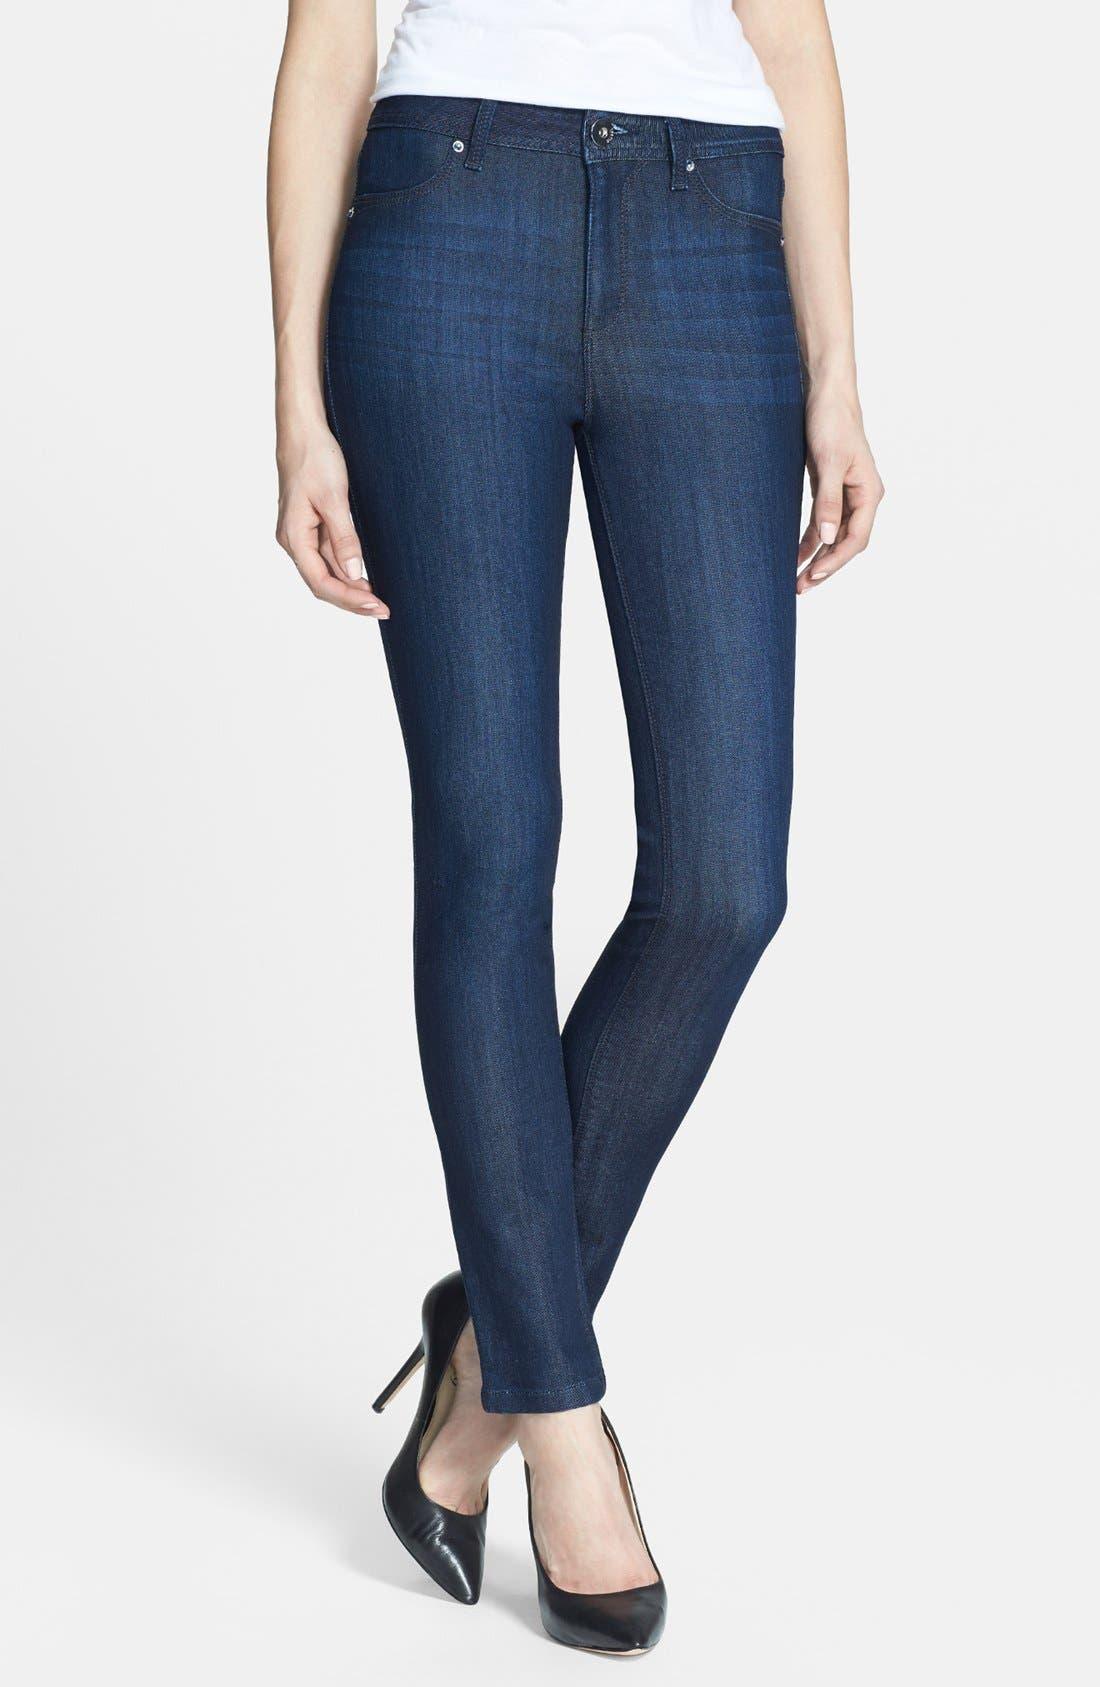 Alternate Image 1 Selected - DL1961 'Nina' High Rise Skinny Jeans (Milan)